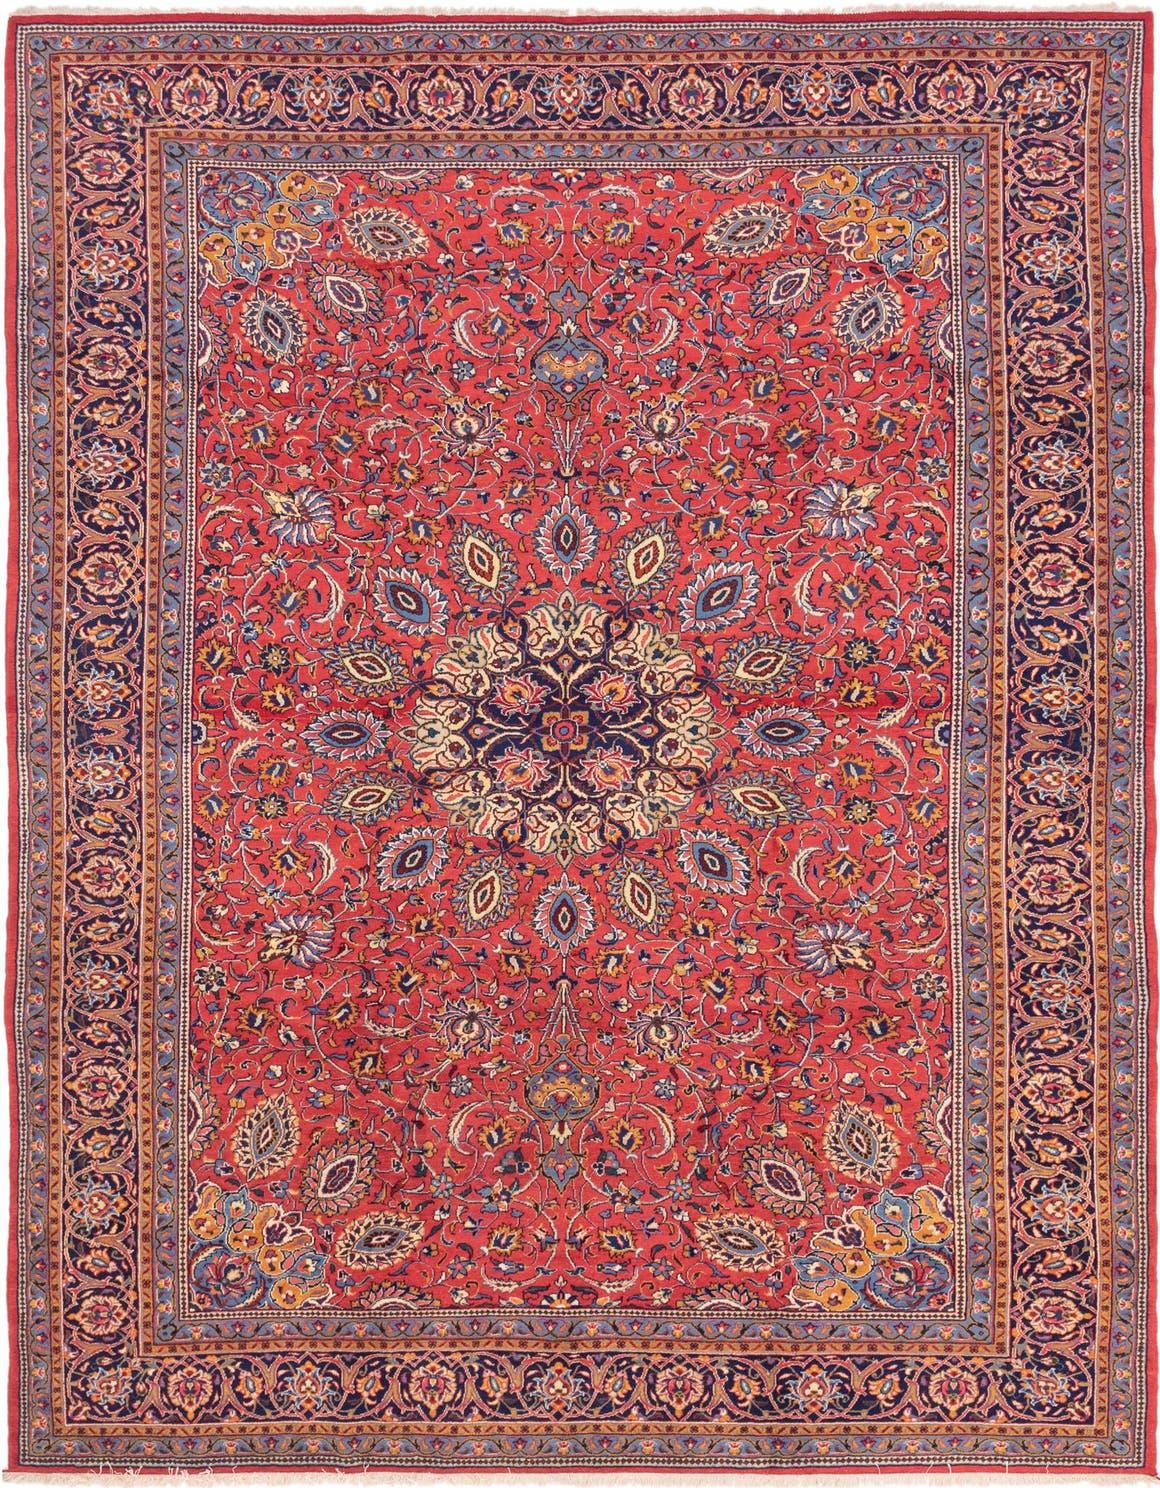 9' 9 x 12' 7 Sarough Persian Rug main image